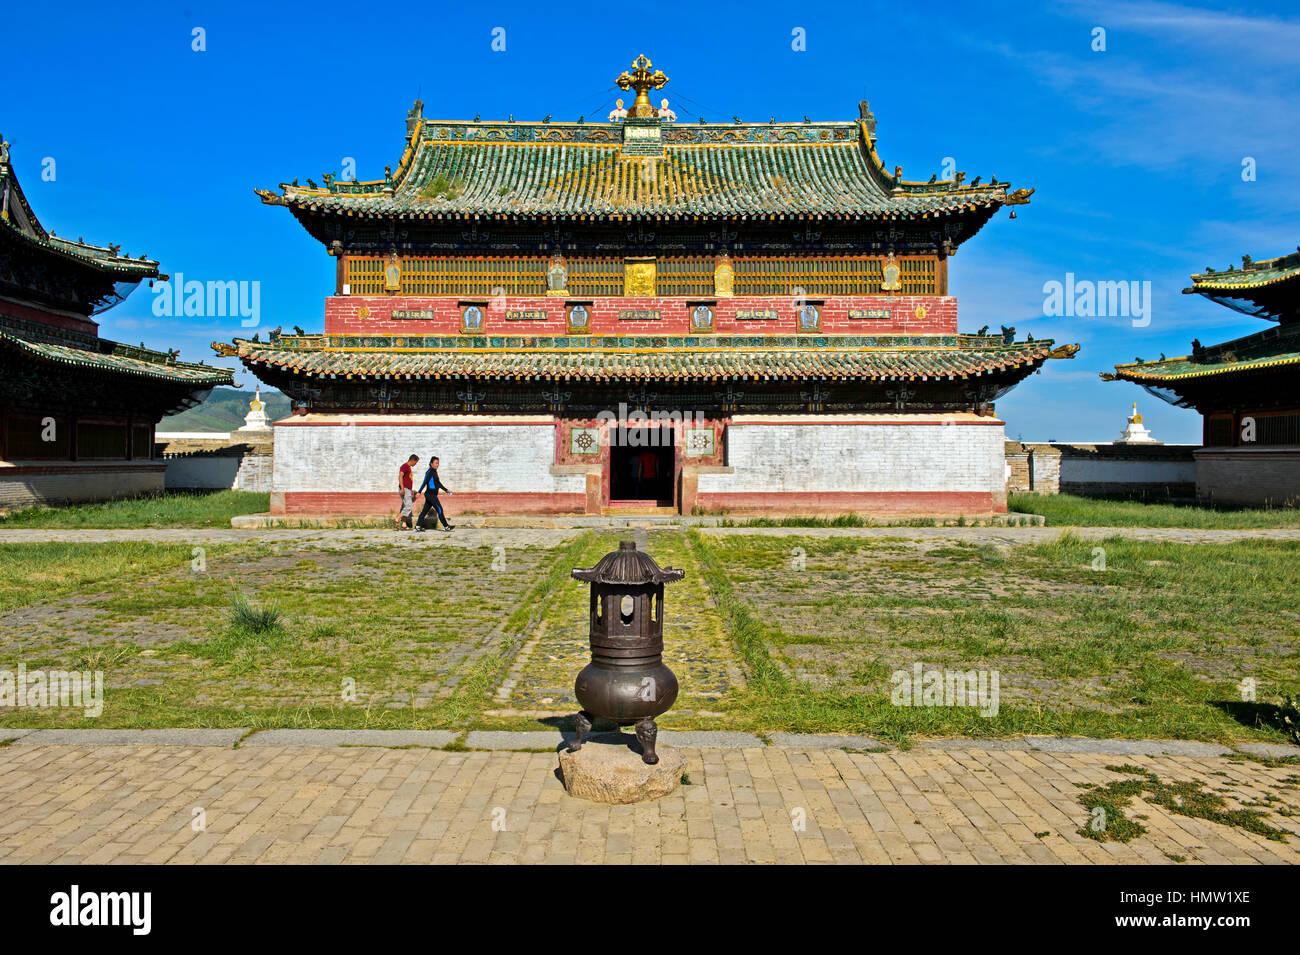 Main temple, Erdene Zuu monastery, Kharkhorin, Övörkhangai Aimag, Mongolia - Stock Image